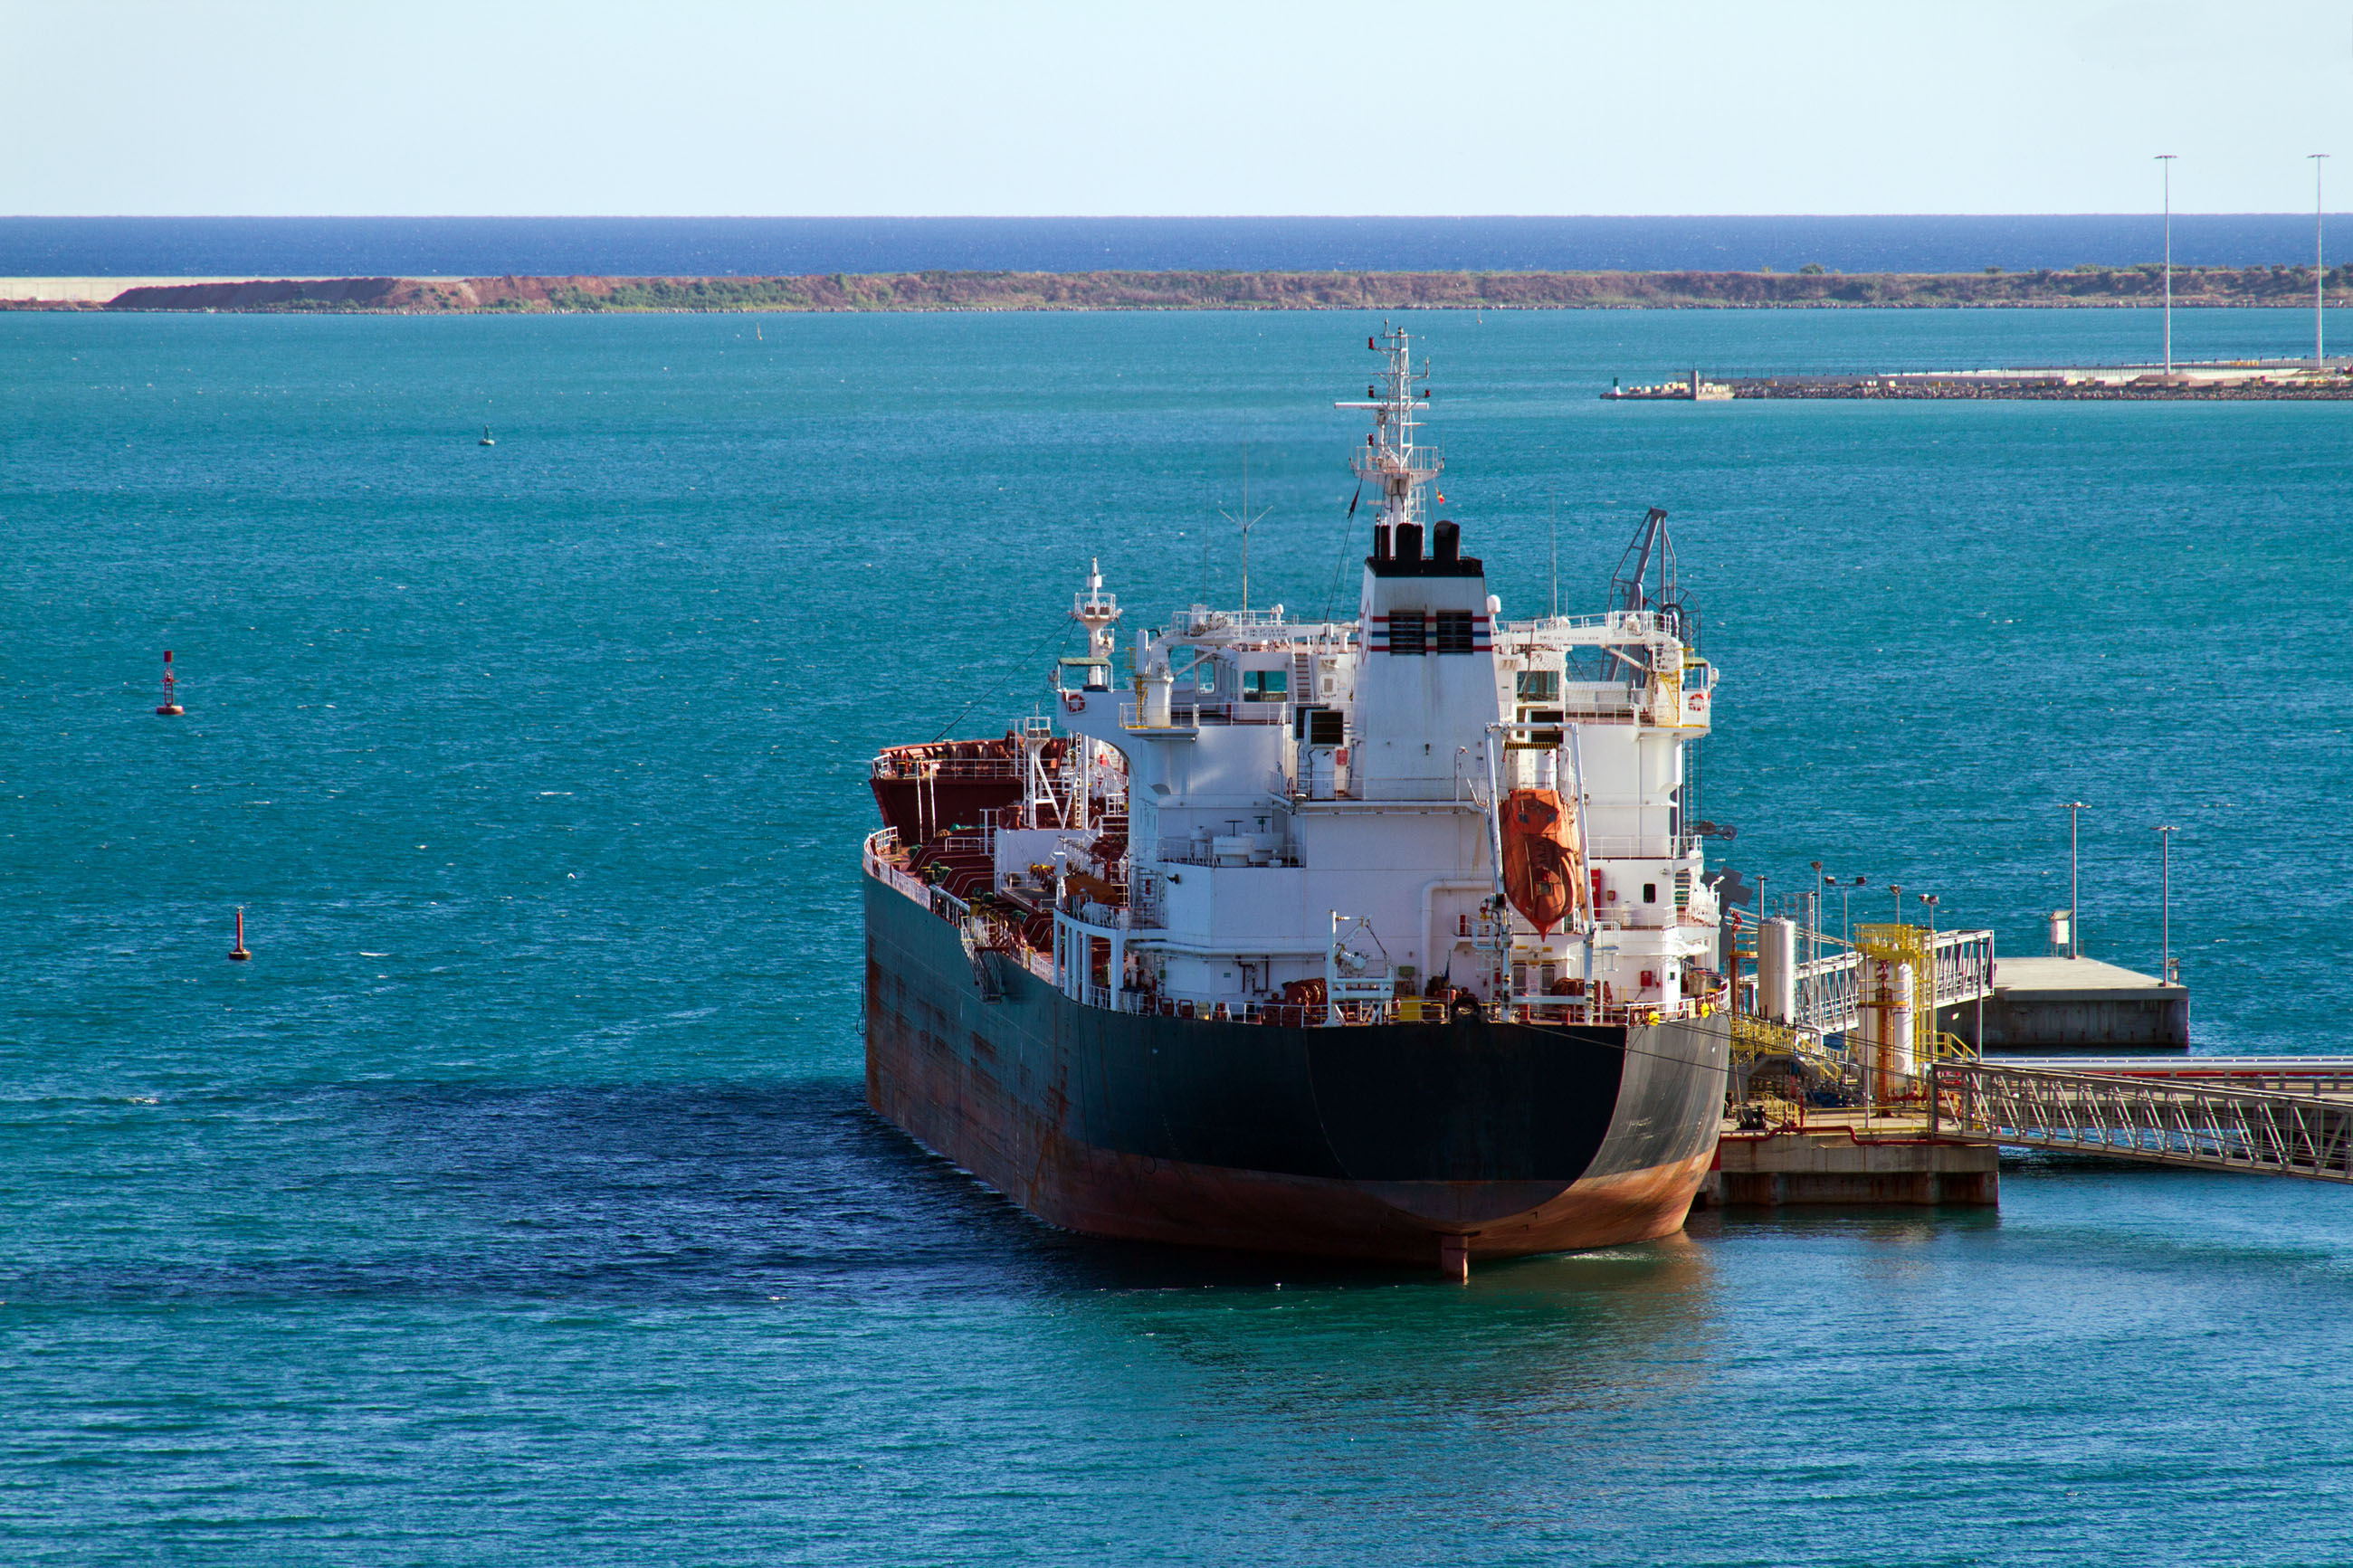 Oil Tanker, Aerial, Infrastructure, International, Logistics, HQ Photo